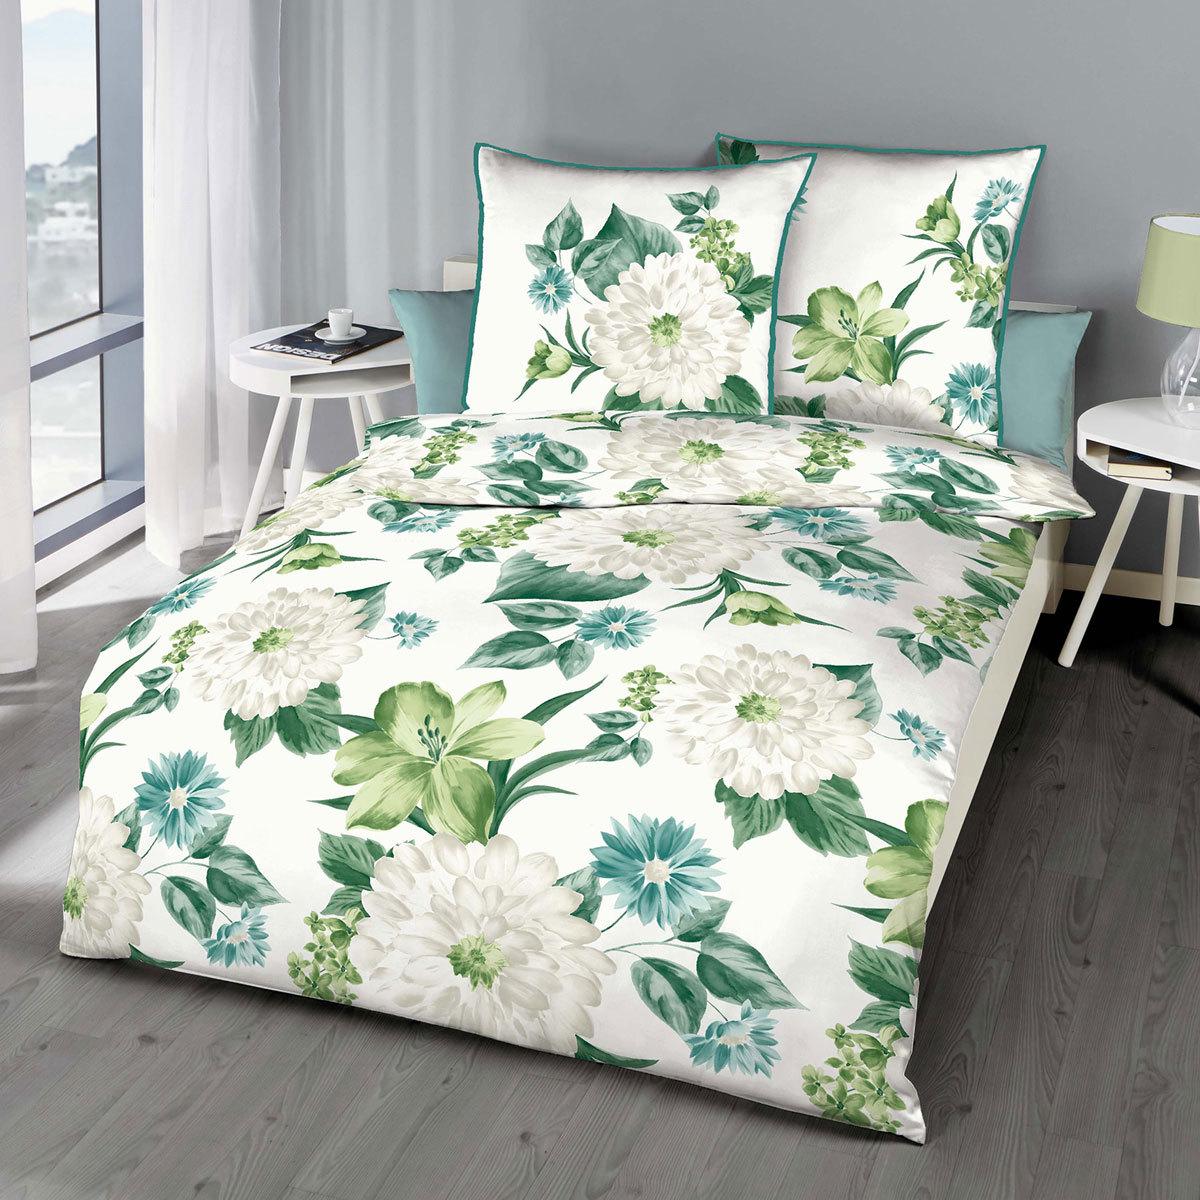 kaeppel mako satin bettw sche mauritius jade erfolgsteams frankfurt. Black Bedroom Furniture Sets. Home Design Ideas